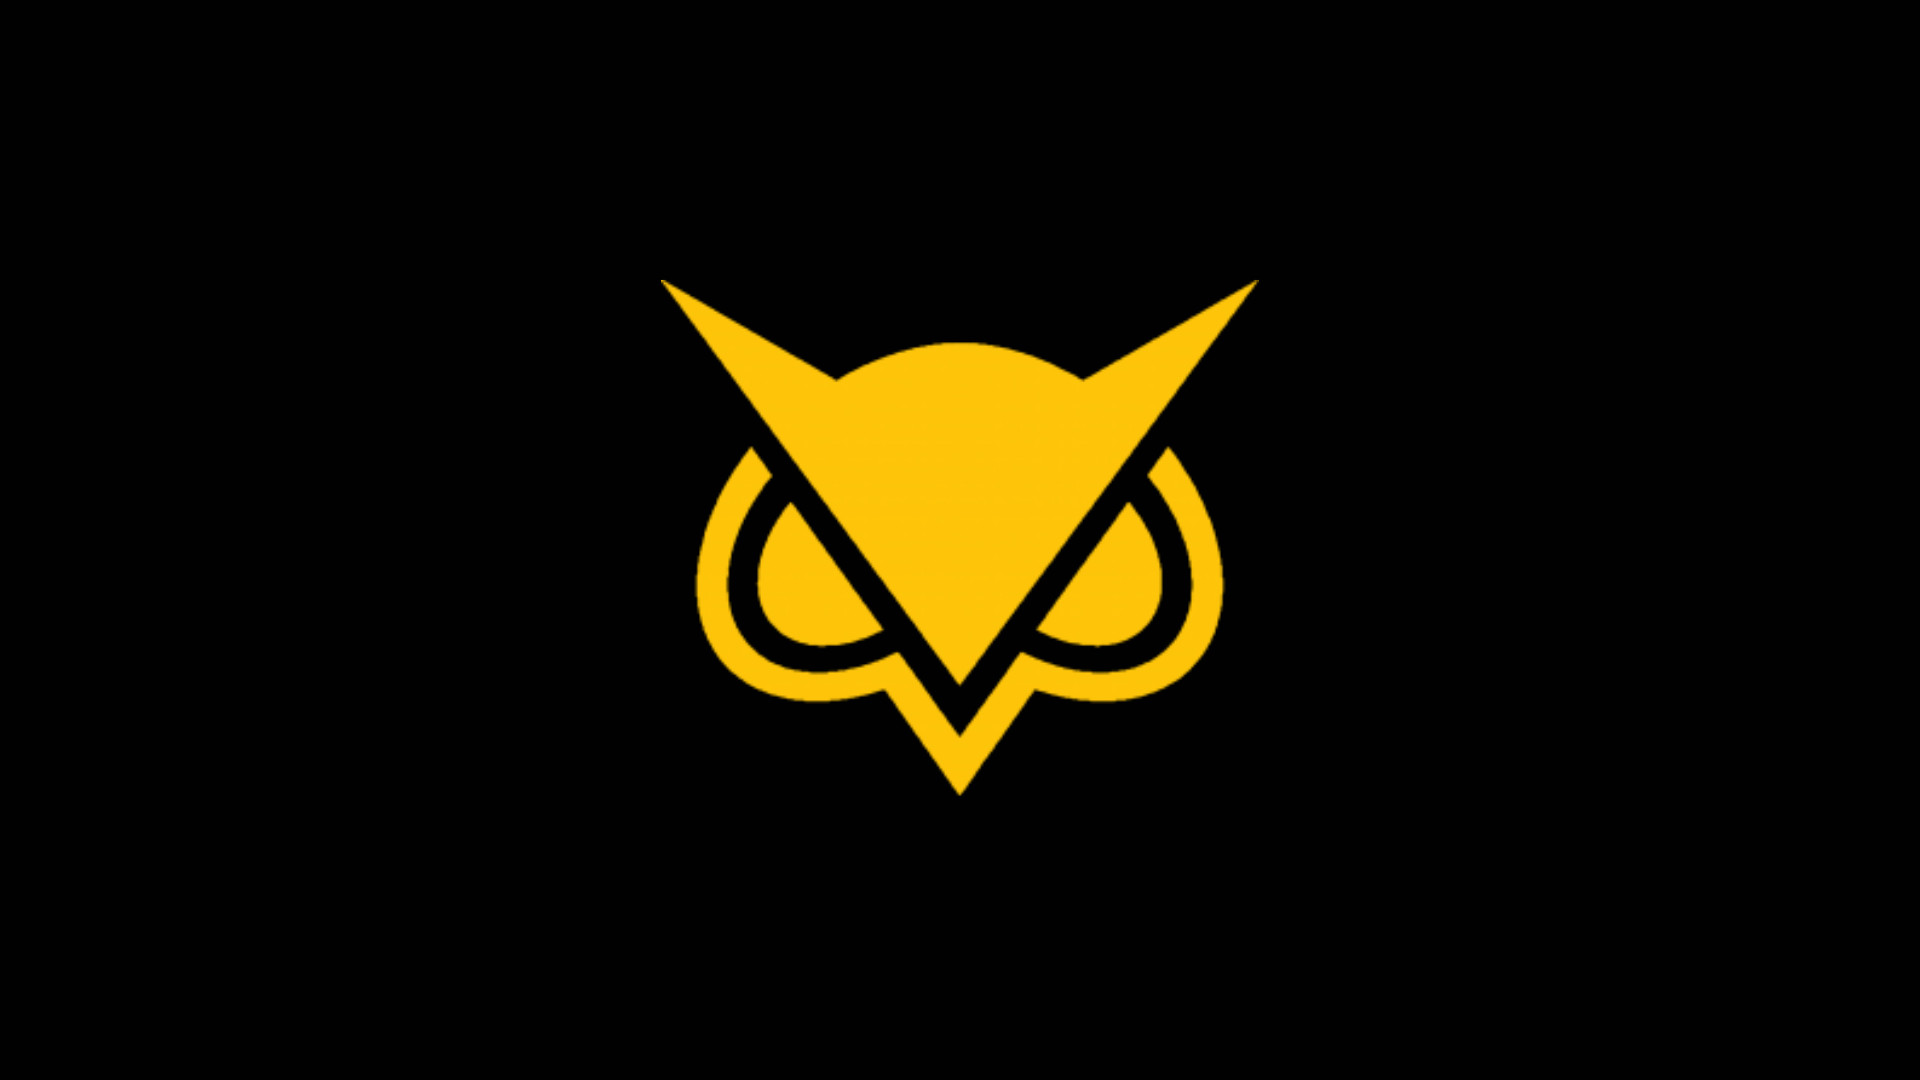 … Vanoss Owl Golden Wallpaper HD by Donnesmarcus